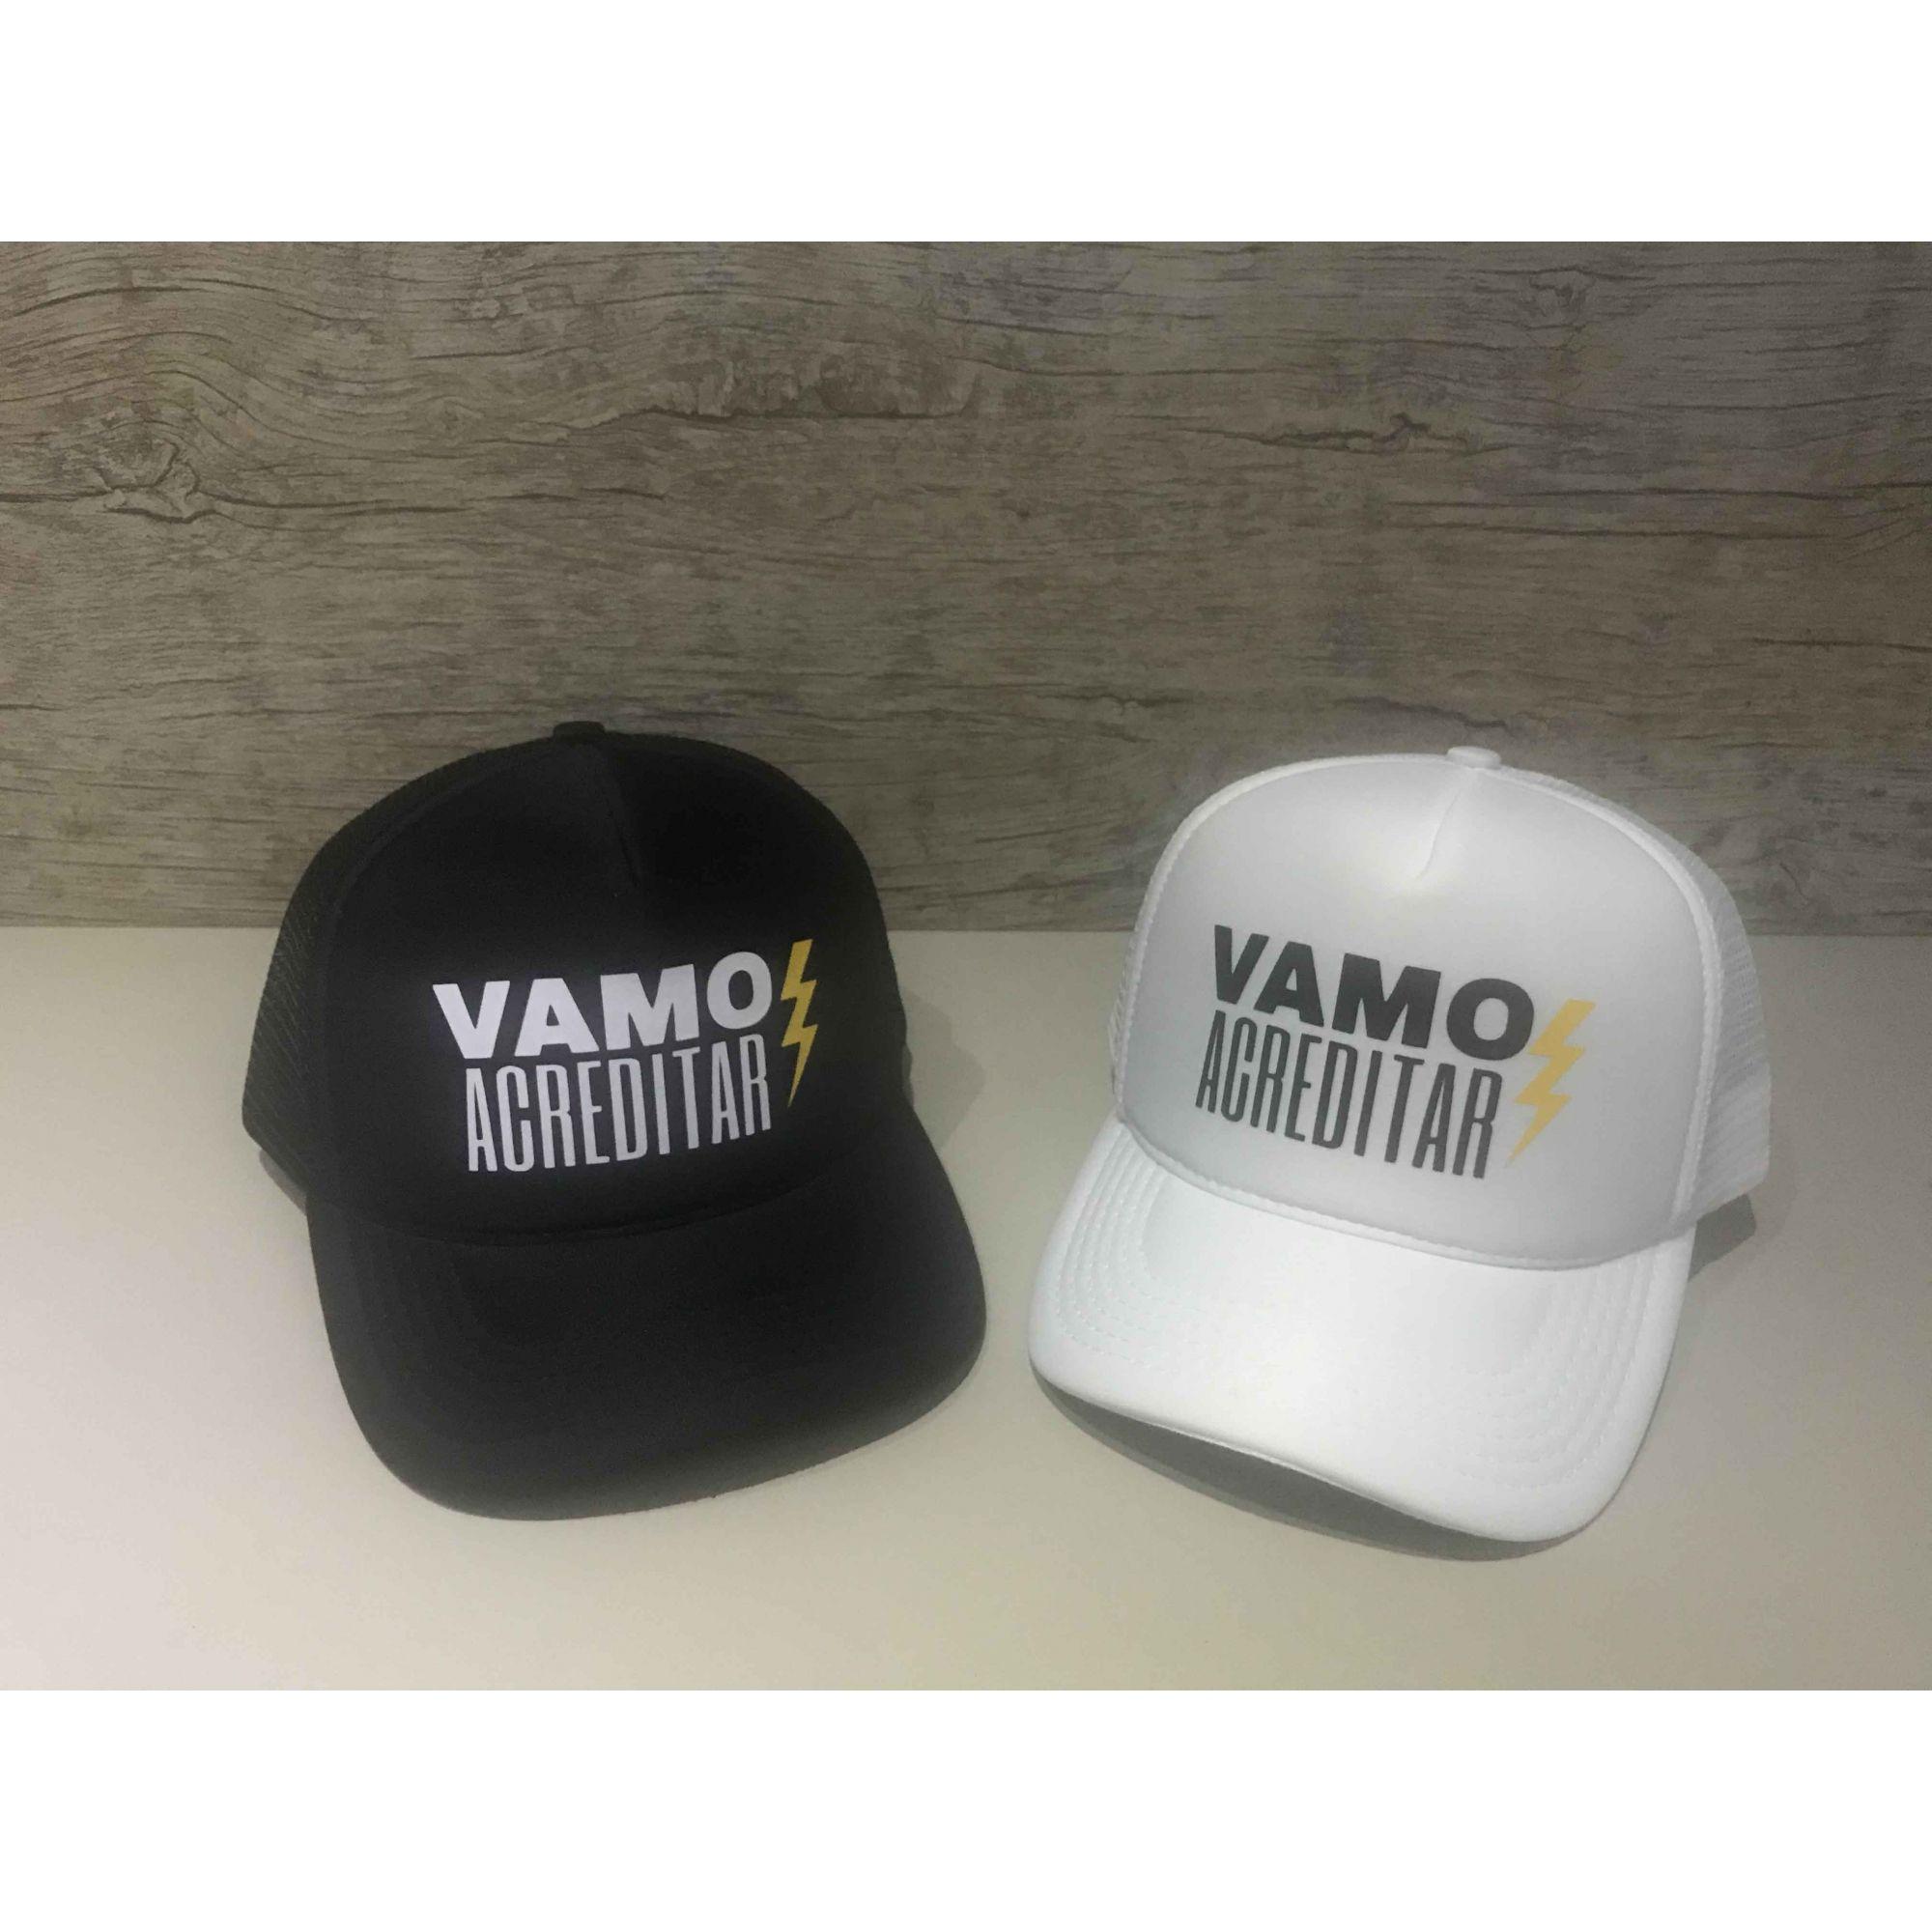 Boné trucker personalizado - Vamo acreditar